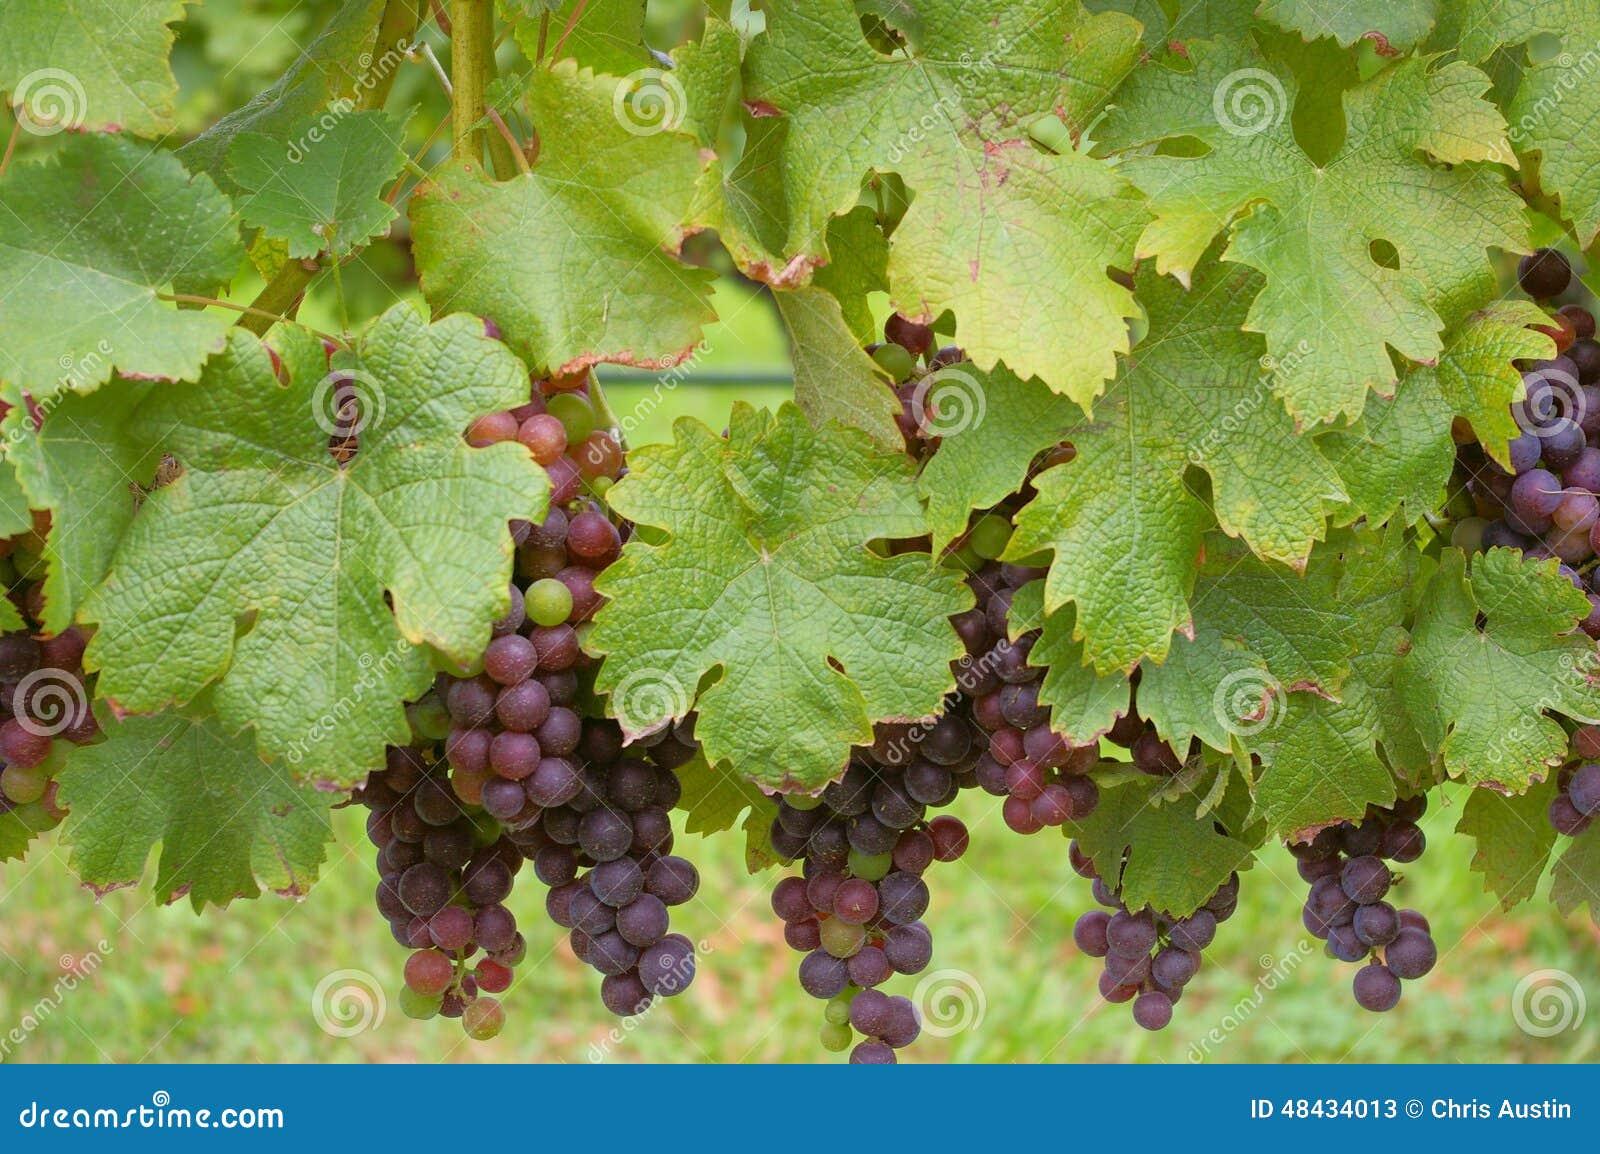 Vine To Wine Long Island